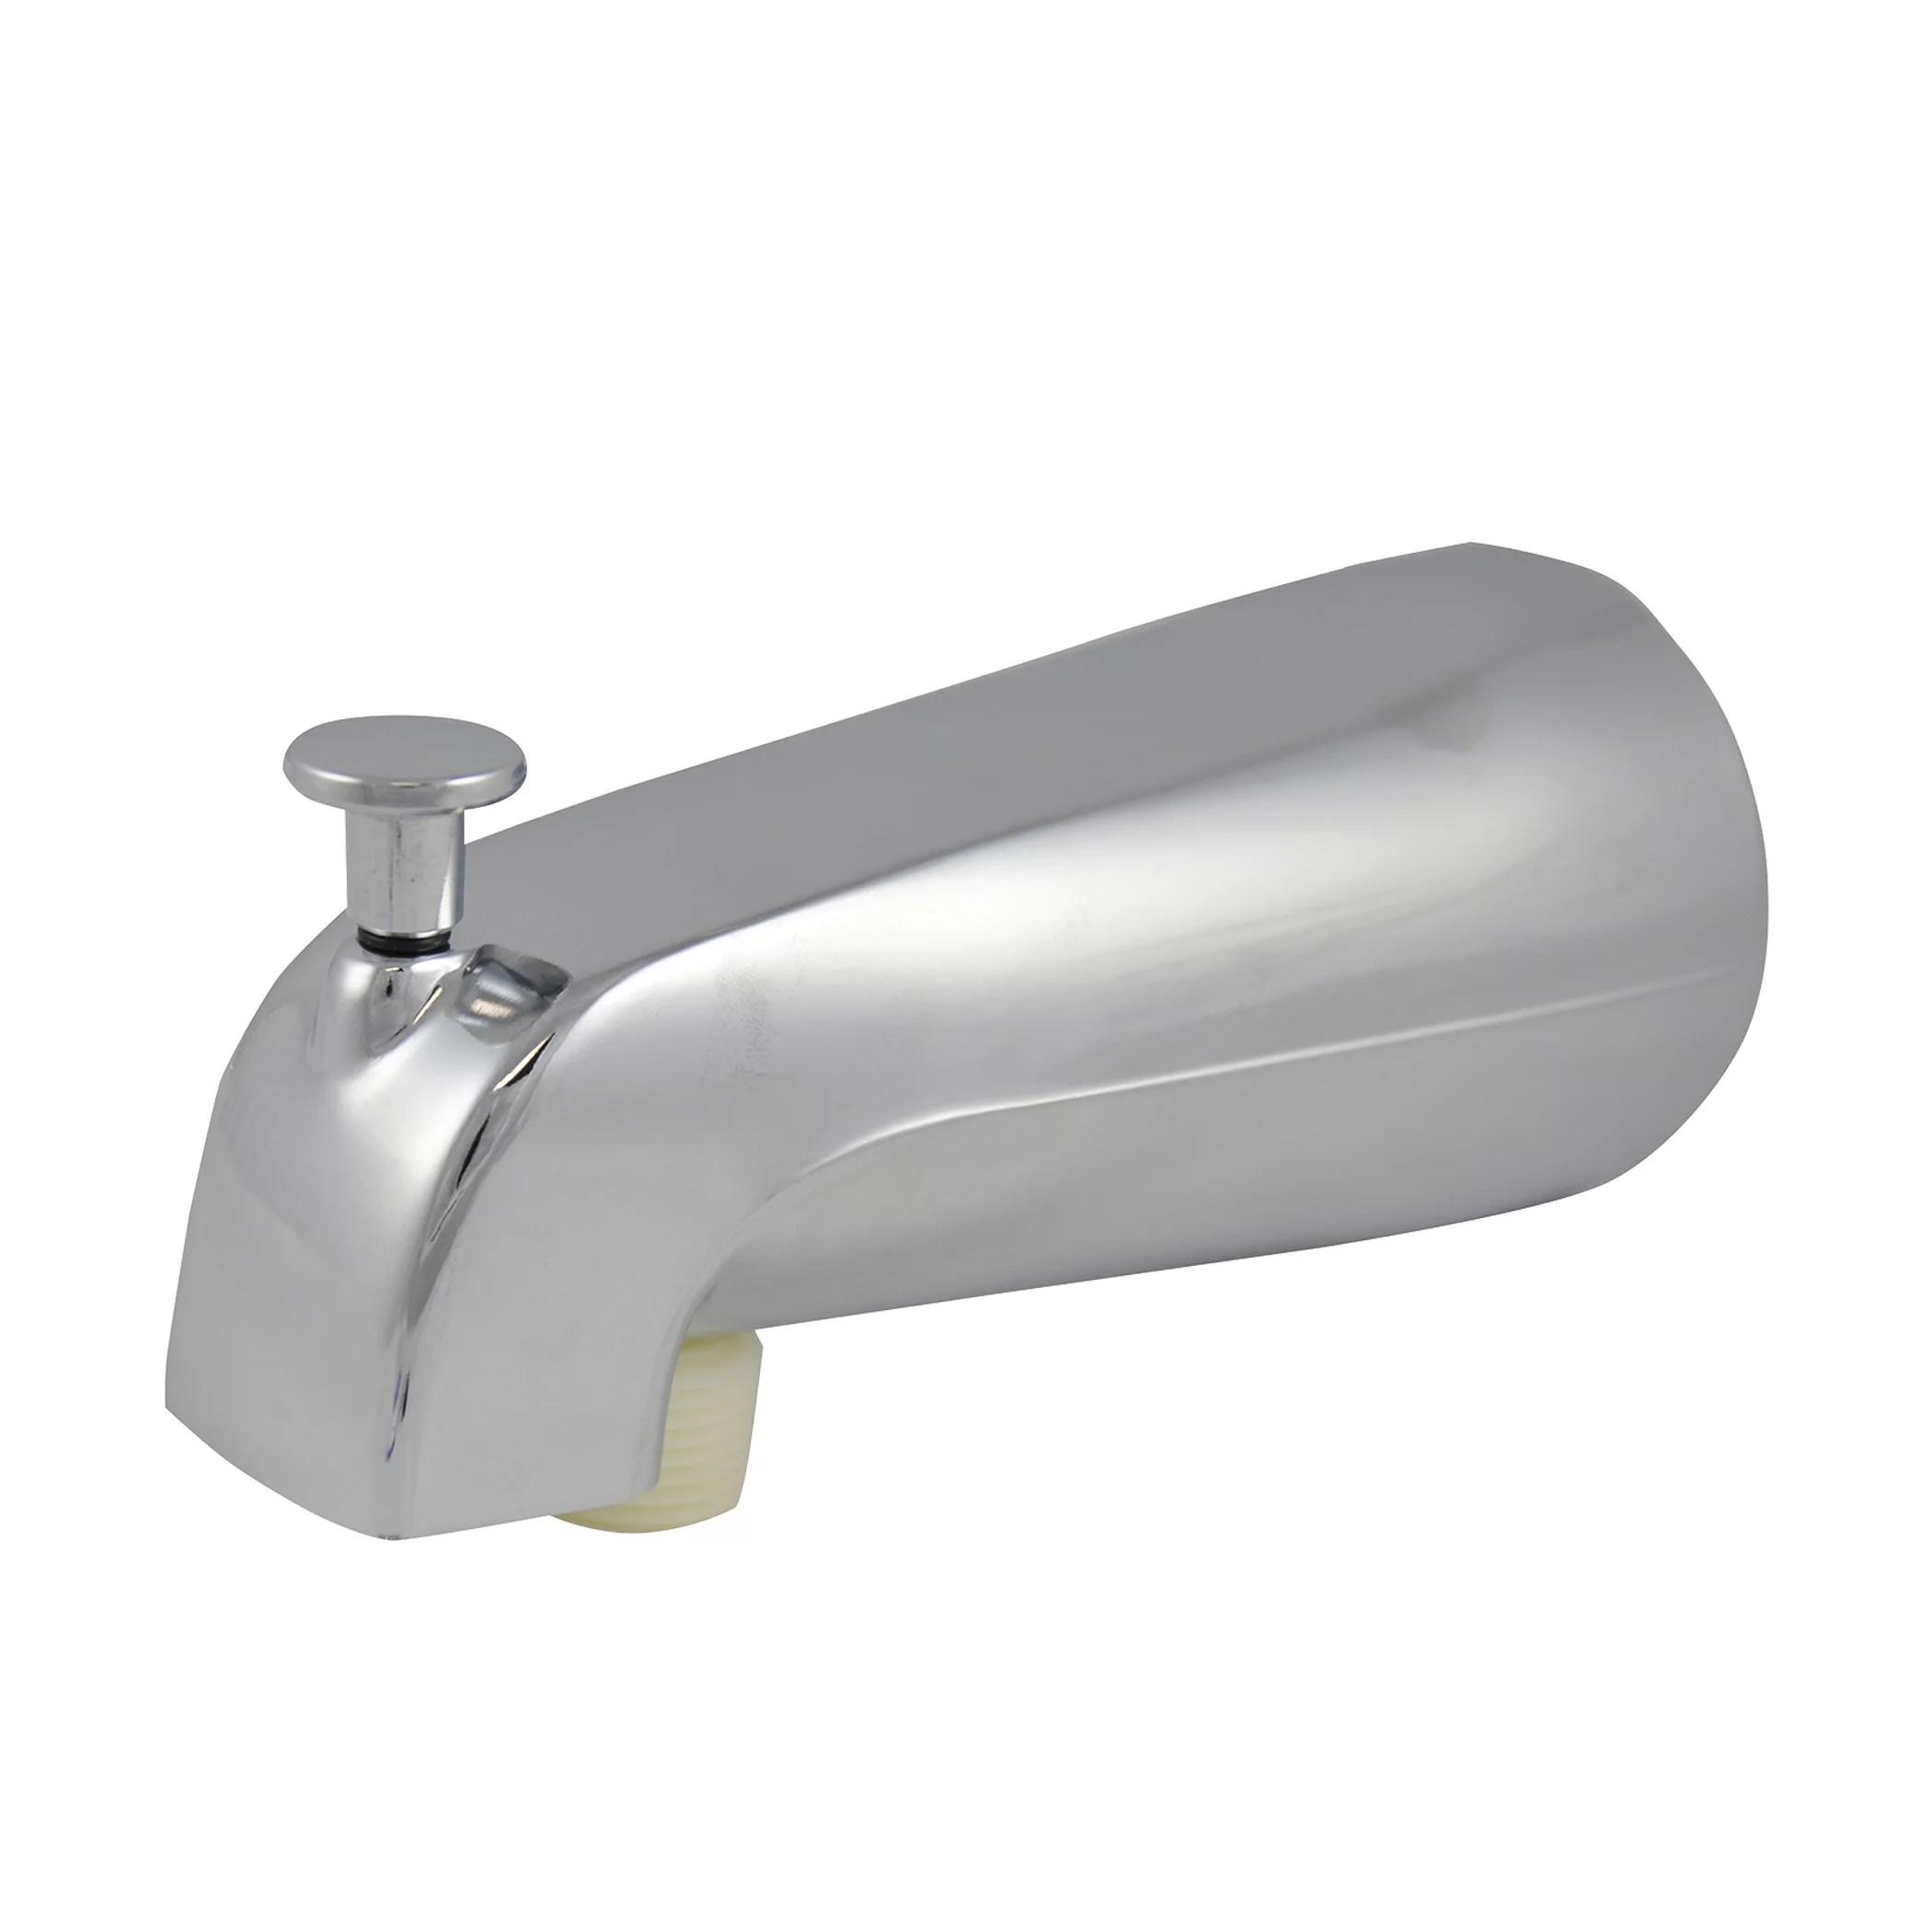 danco universal tub spout with handheld shower fitting chrome 89266 walmart com